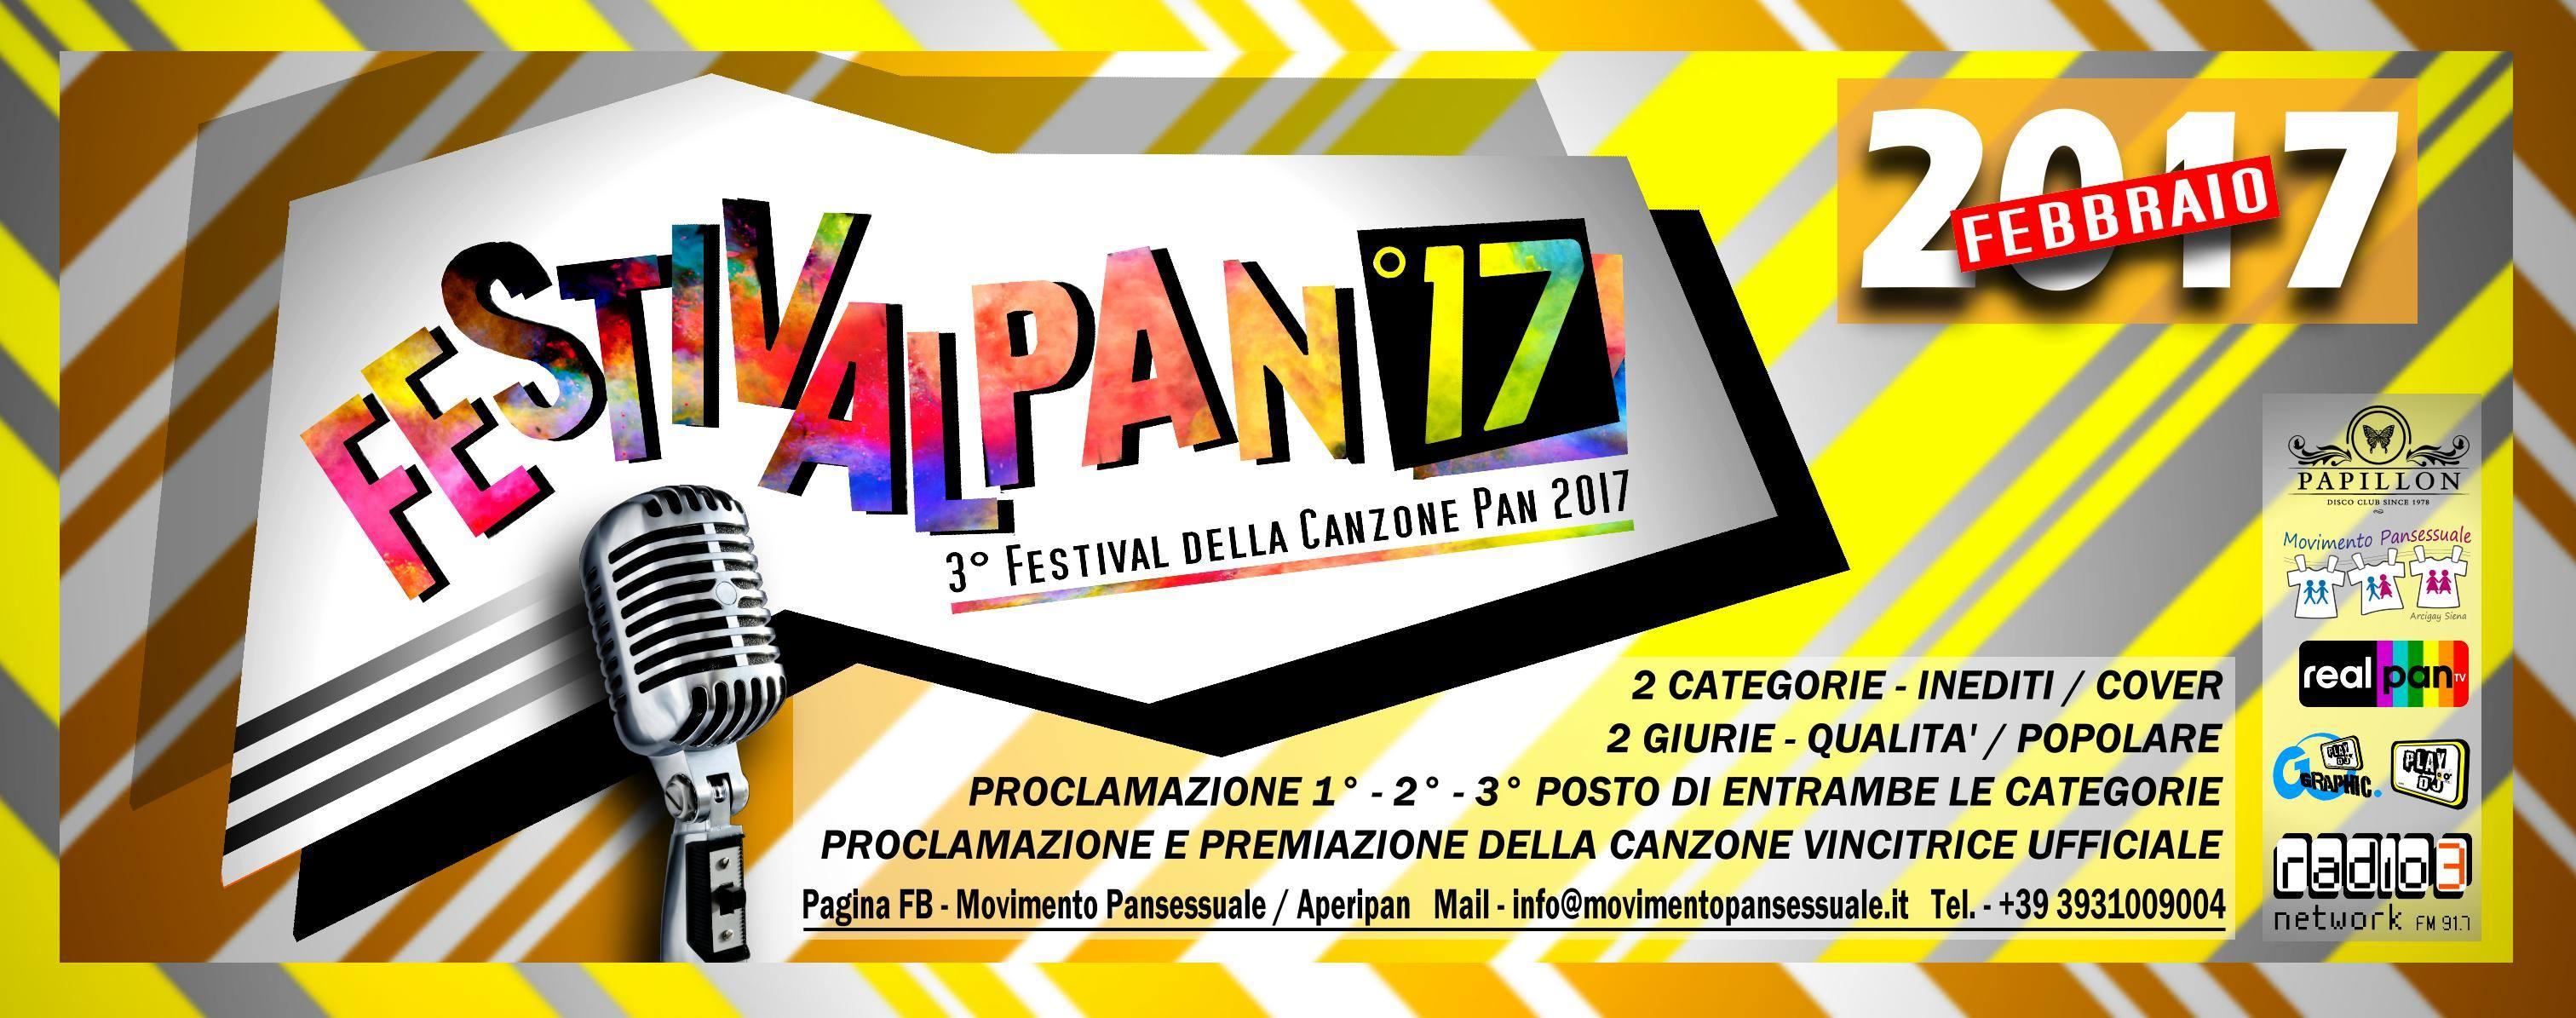 festivalpan-2017-cover